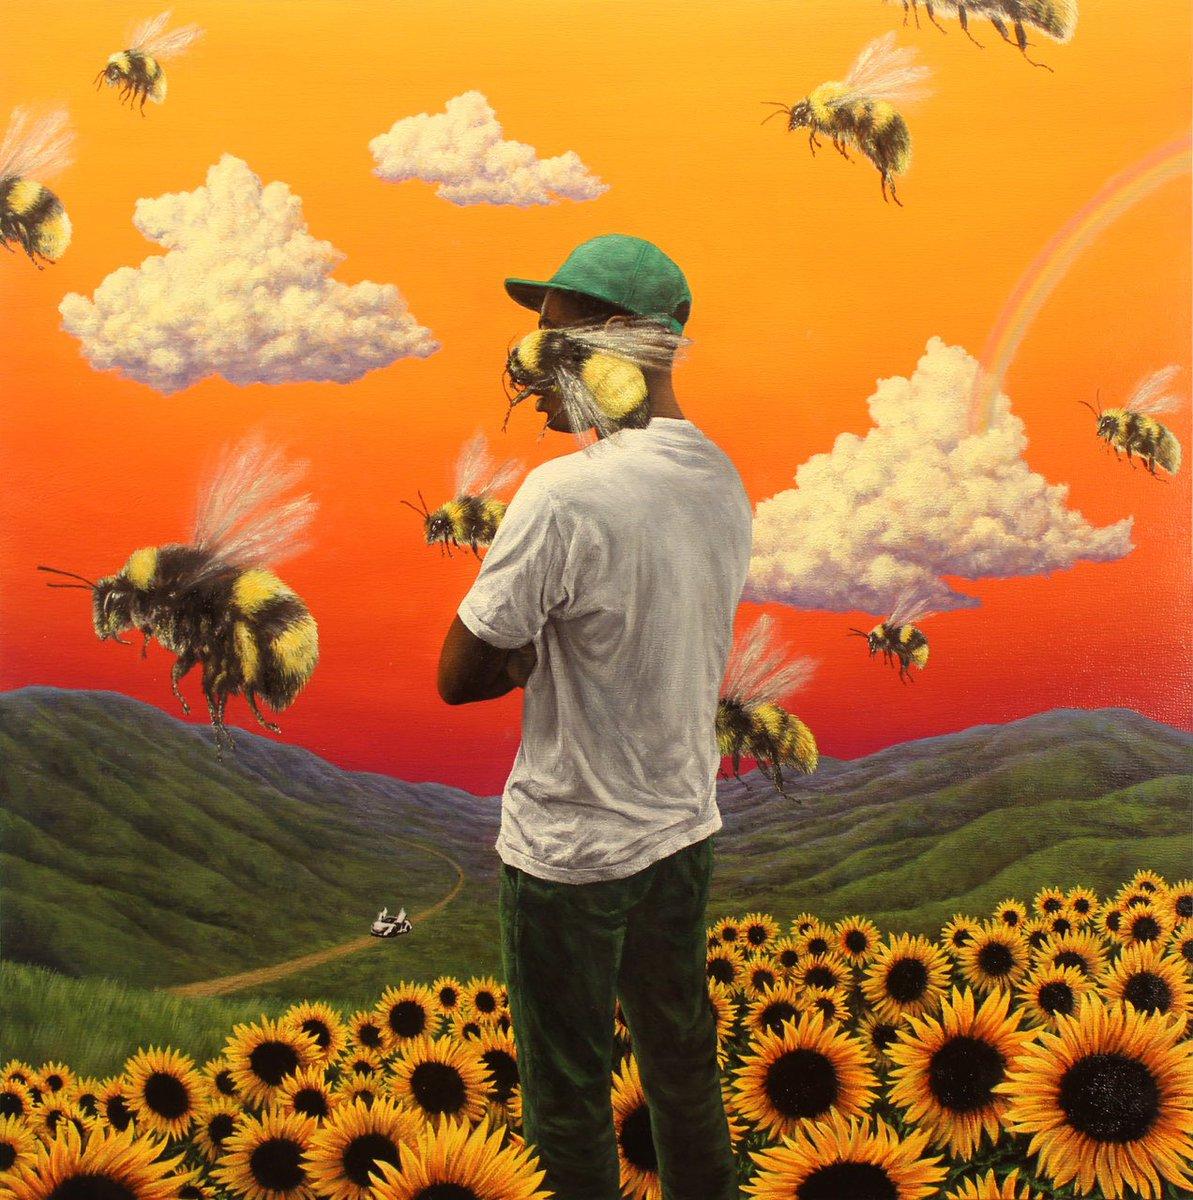 Tyler, The Creator flower boy